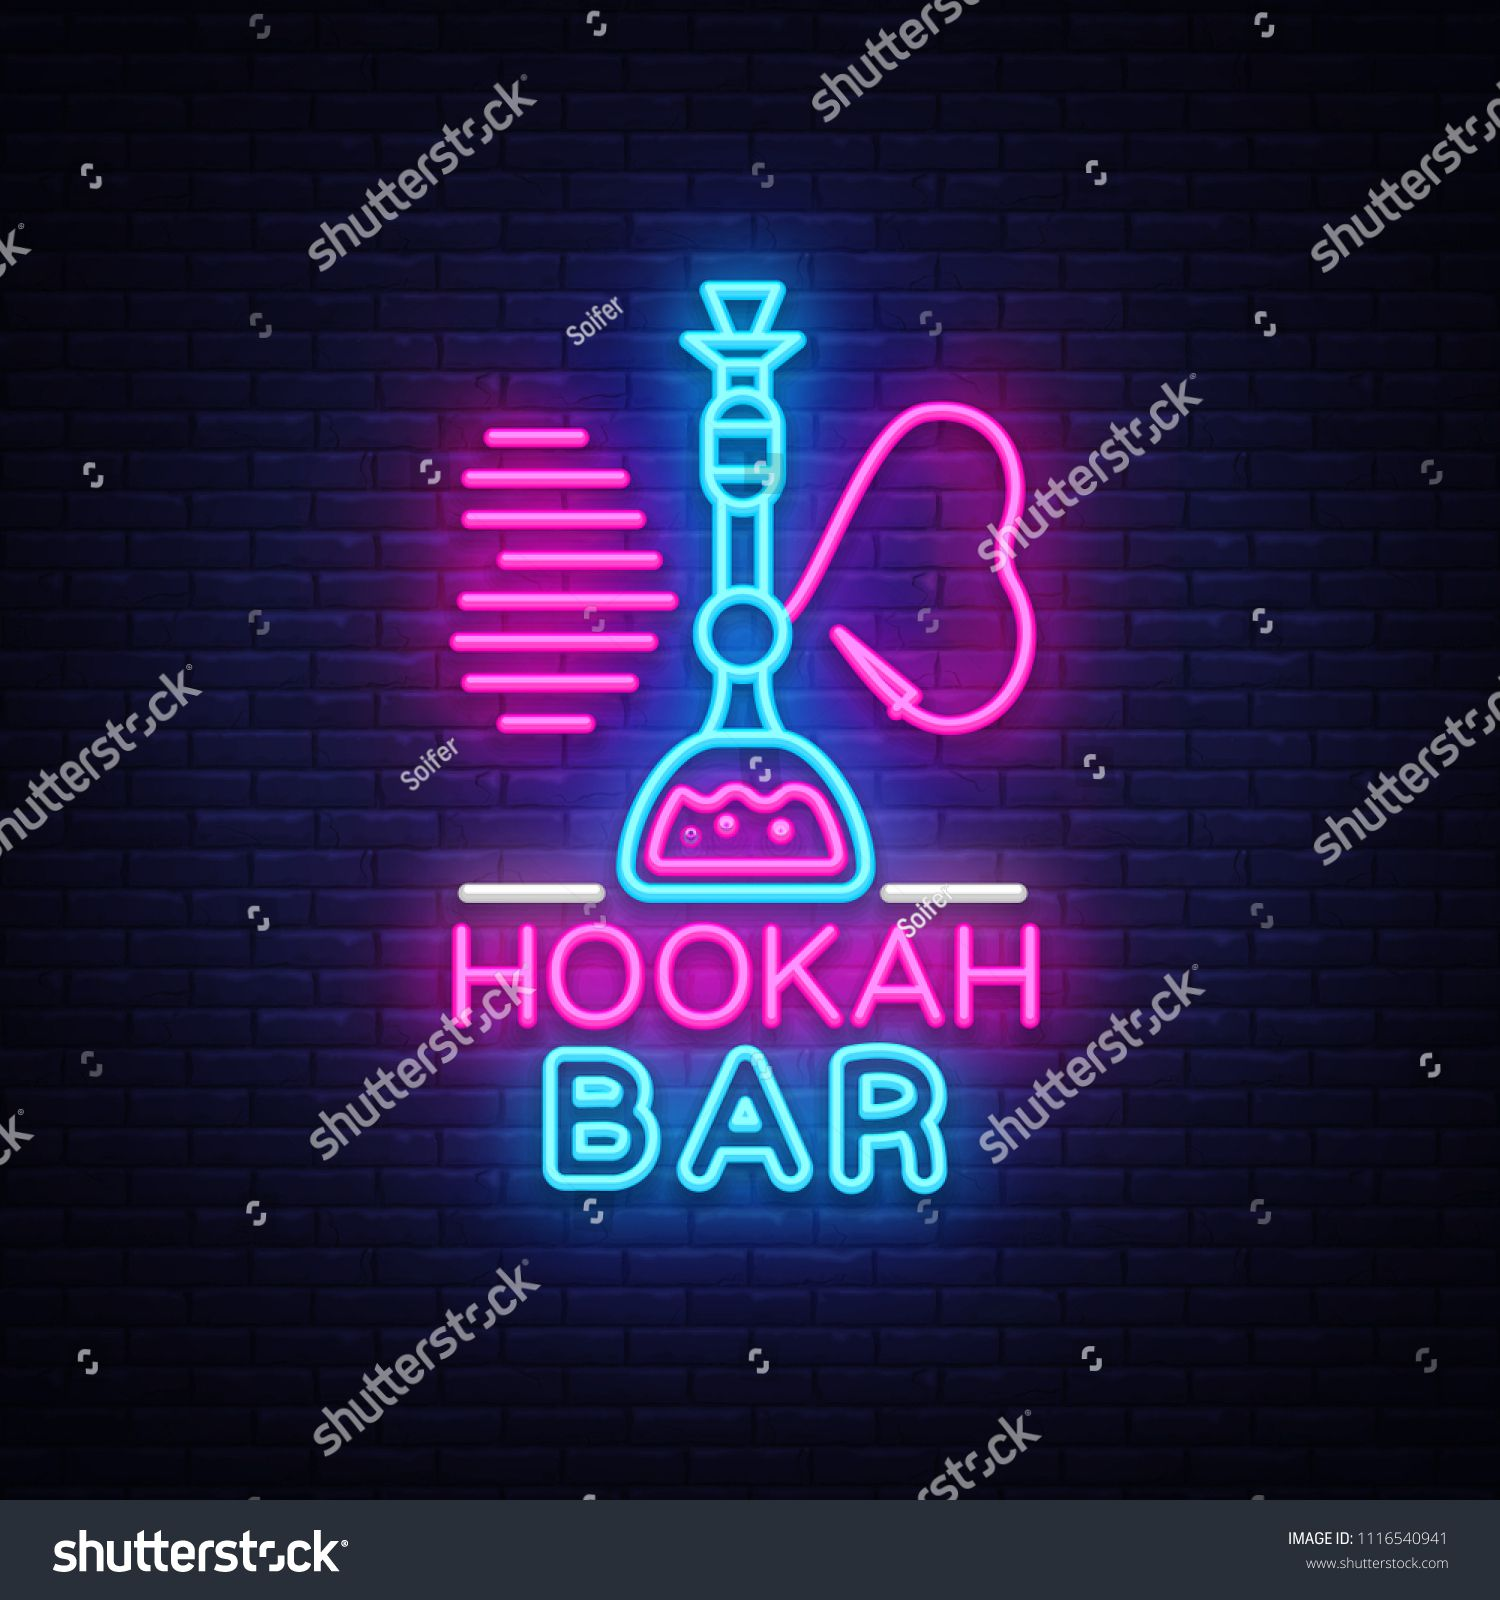 Hookah Bar Neon Sign Vector Night Hookah Design Template Light